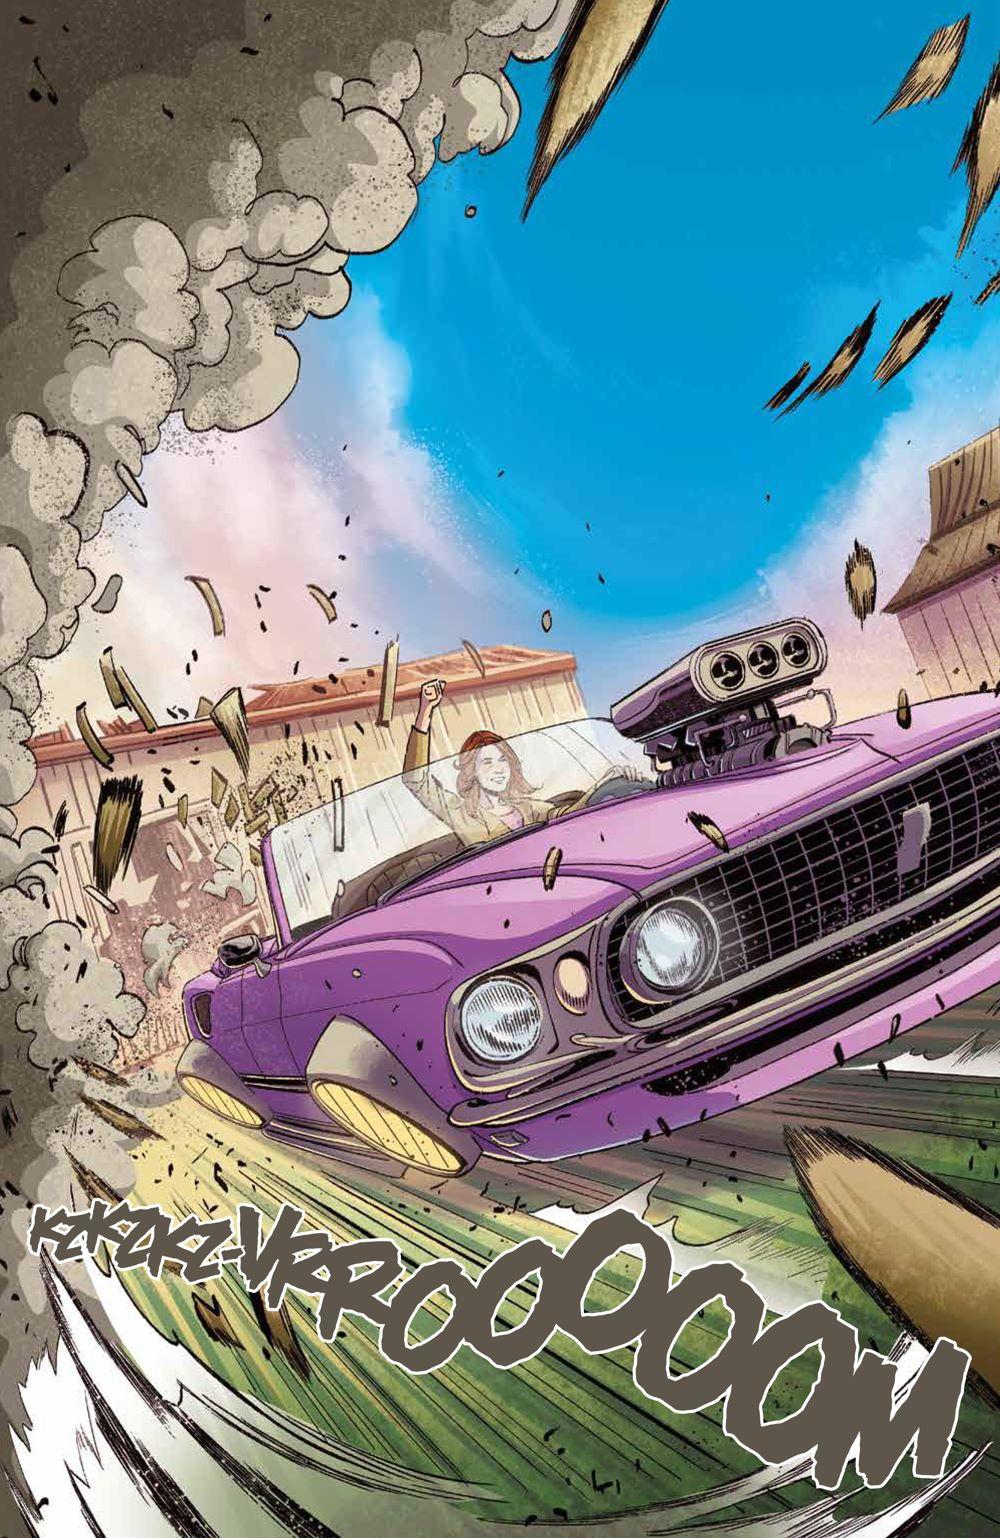 Firefly_BrandNewVerse_004_PRESS_6 ComicList Previews: FIREFLY A BRAND NEW 'VERSE #4 (OF 6)